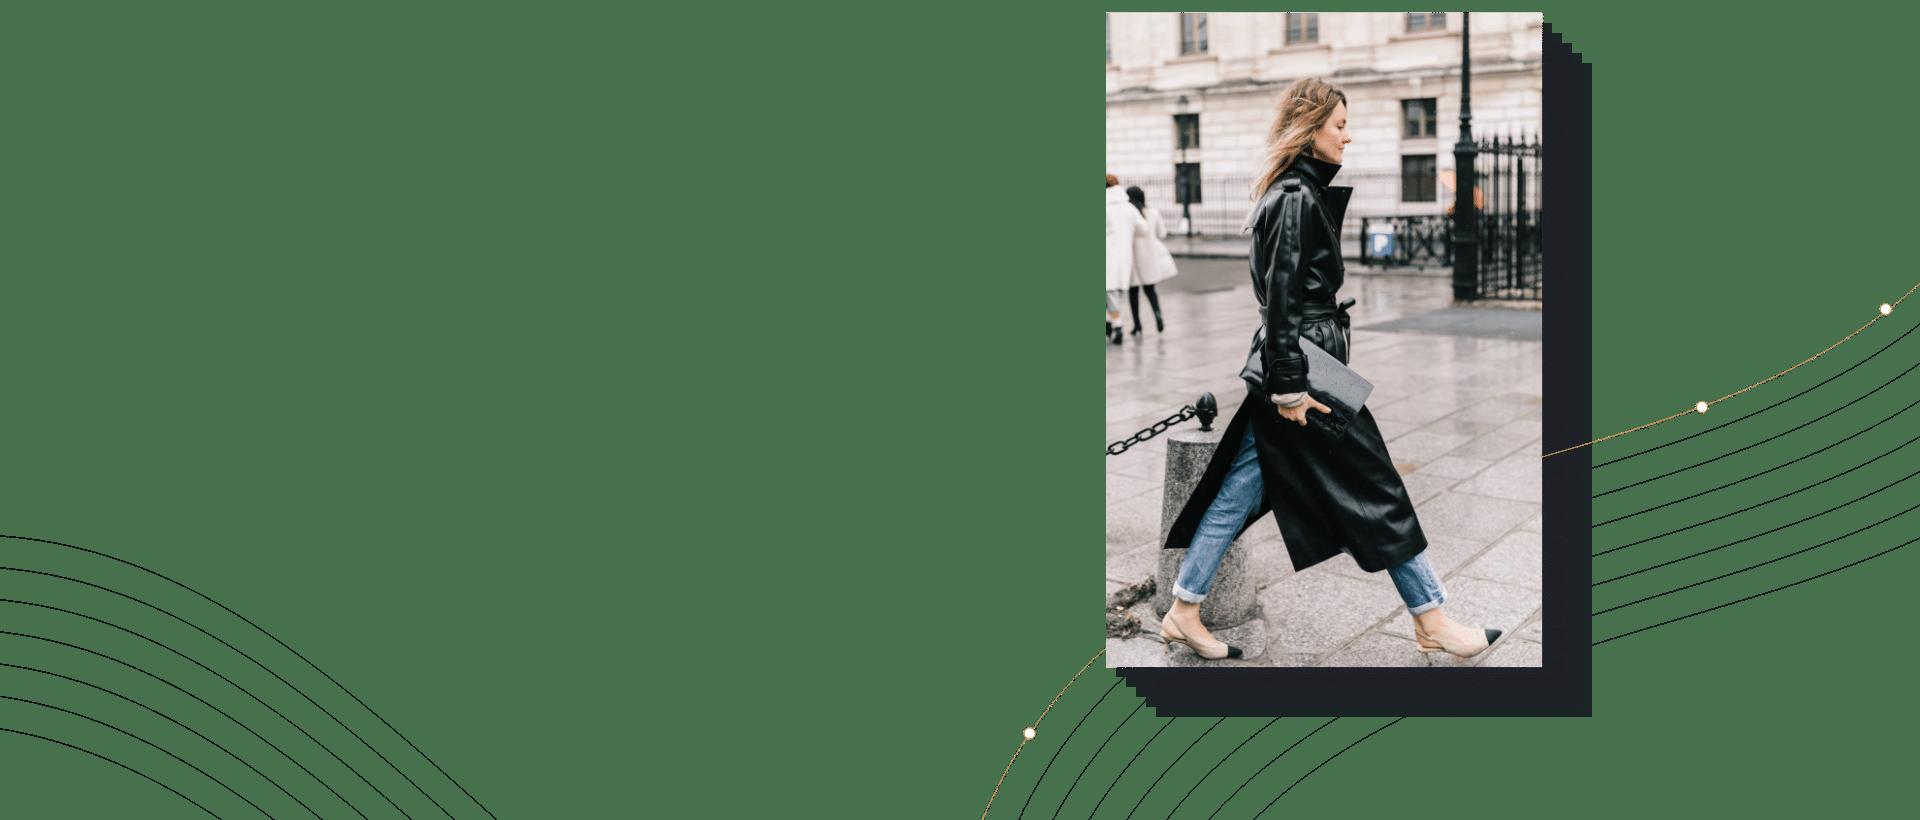 Paris Fashion Week - woman with black coat